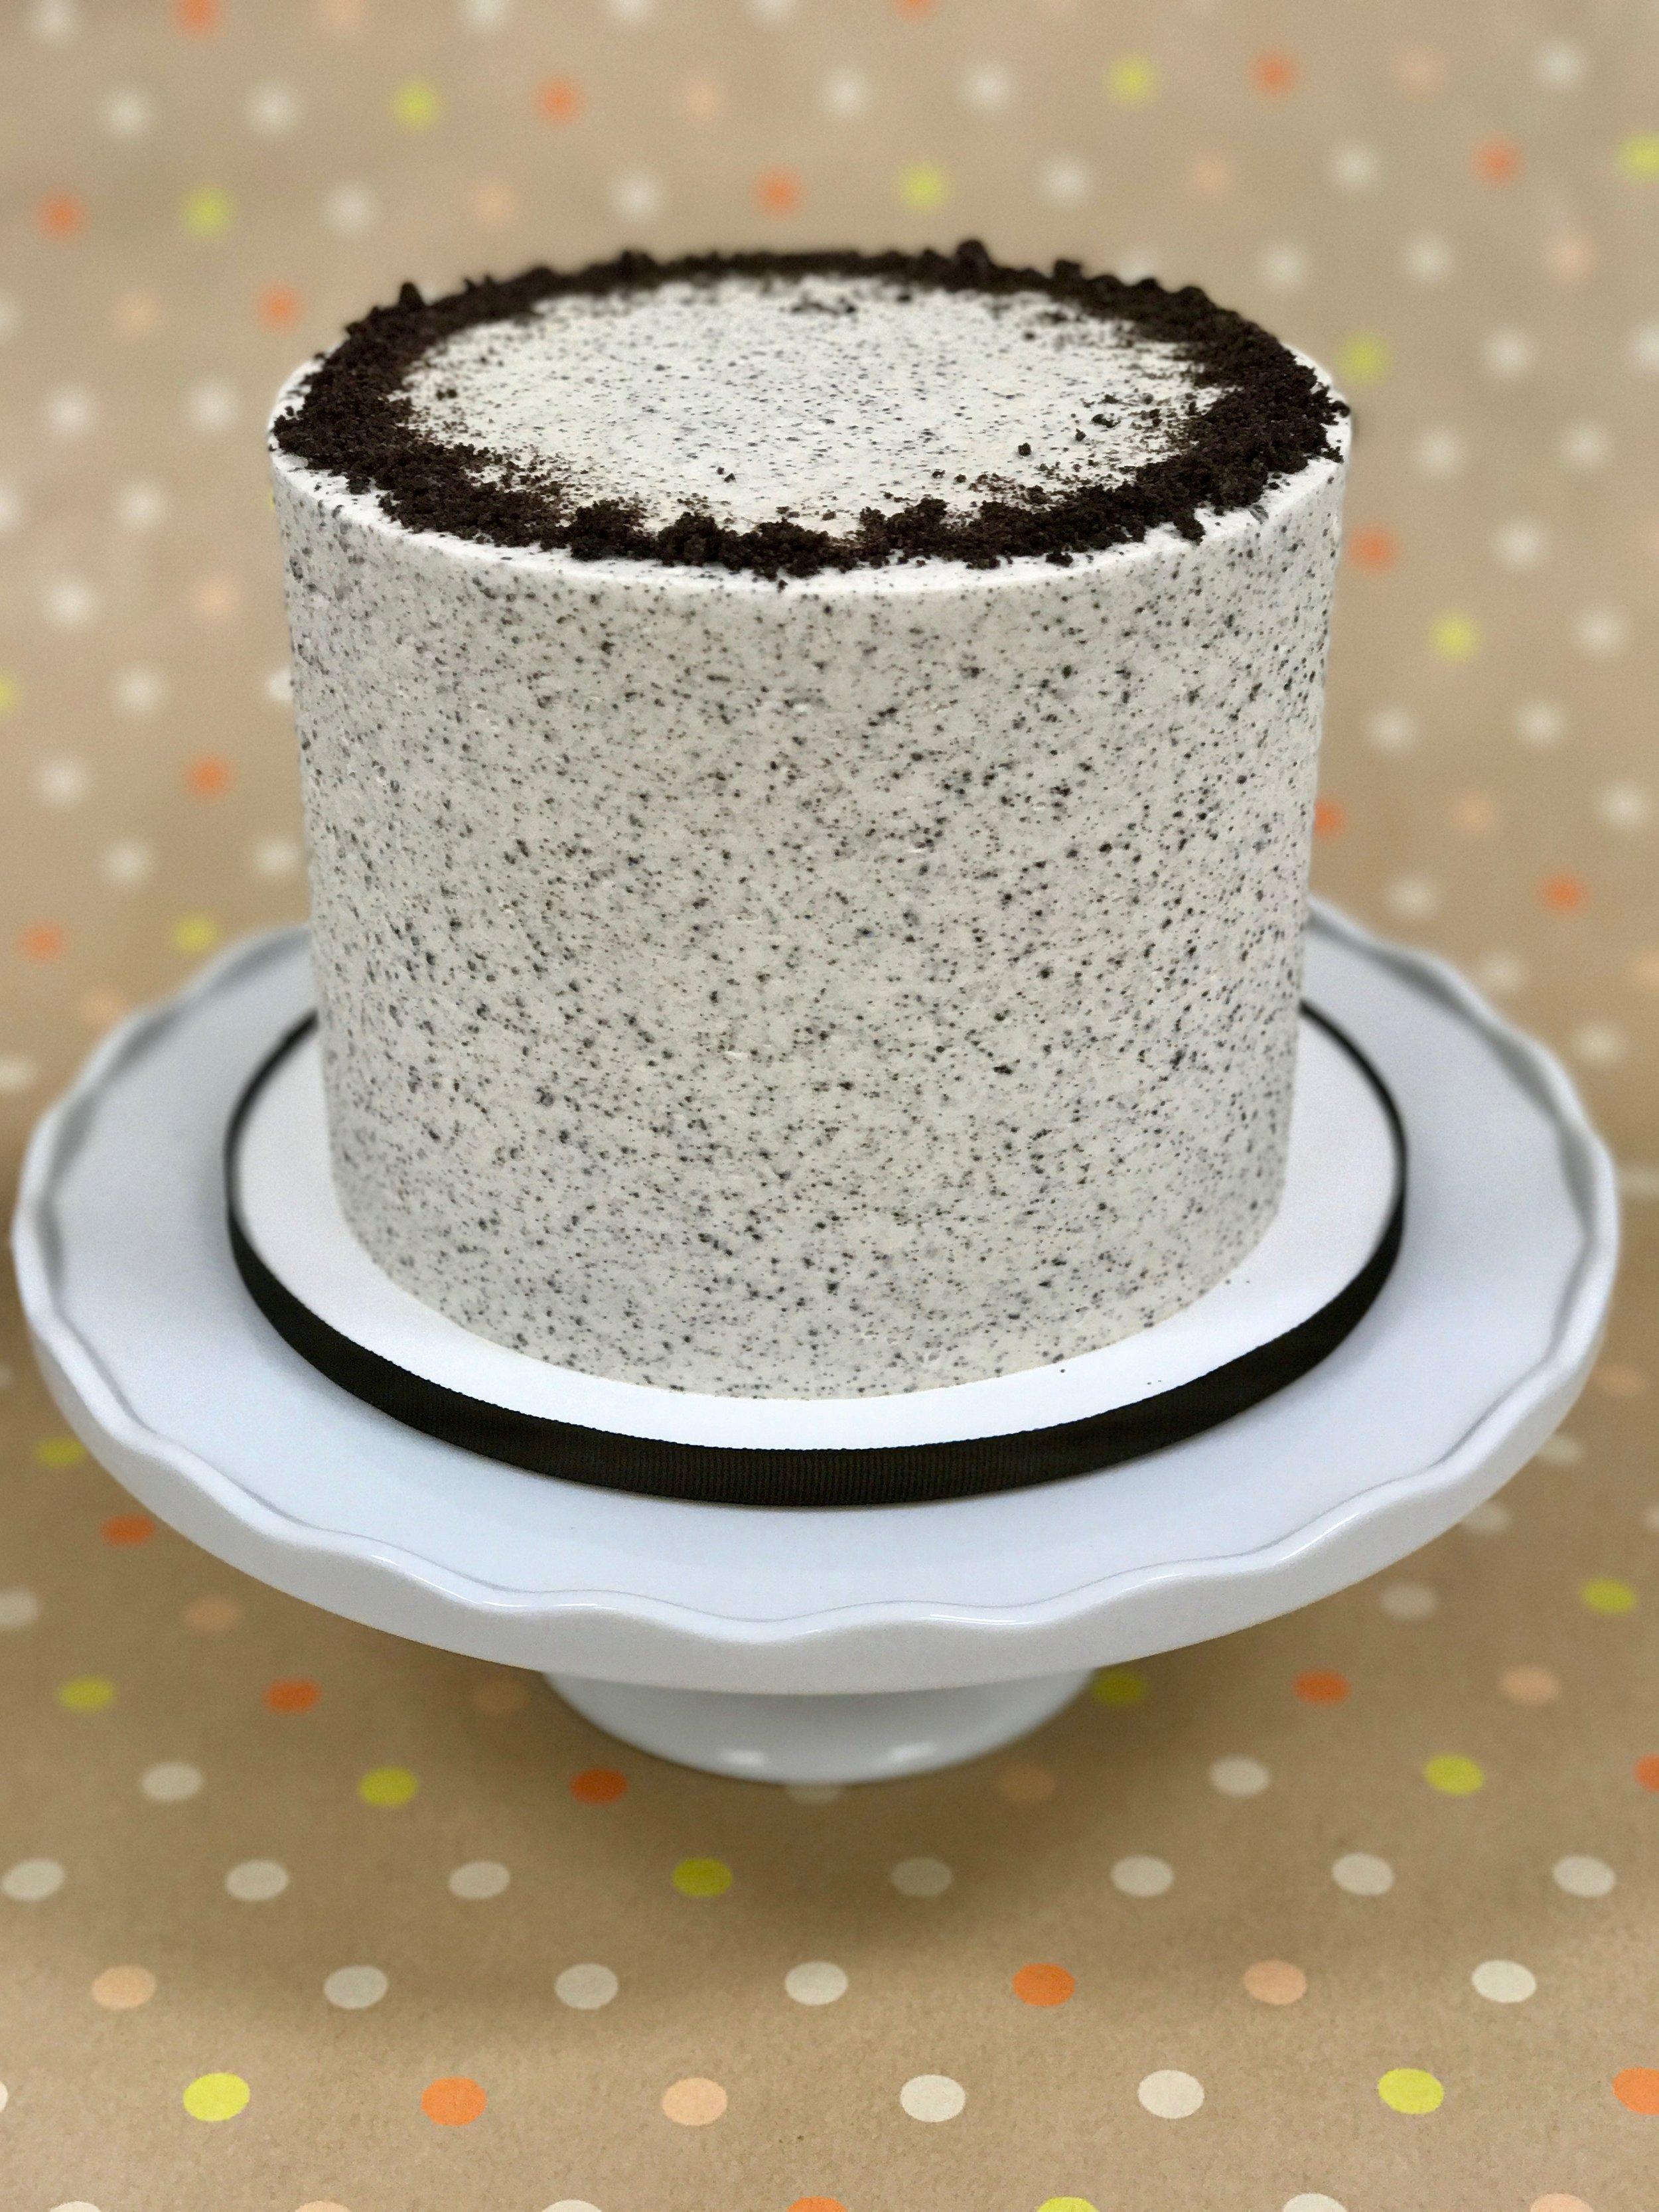 Cookies & Cream - Cake: Vanilla Bean with Crushed OreosFilling: Oreo Swiss Meringue ButtercreamFrosting: Oreo Swiss Meringue Buttercream and Crushed Oreos